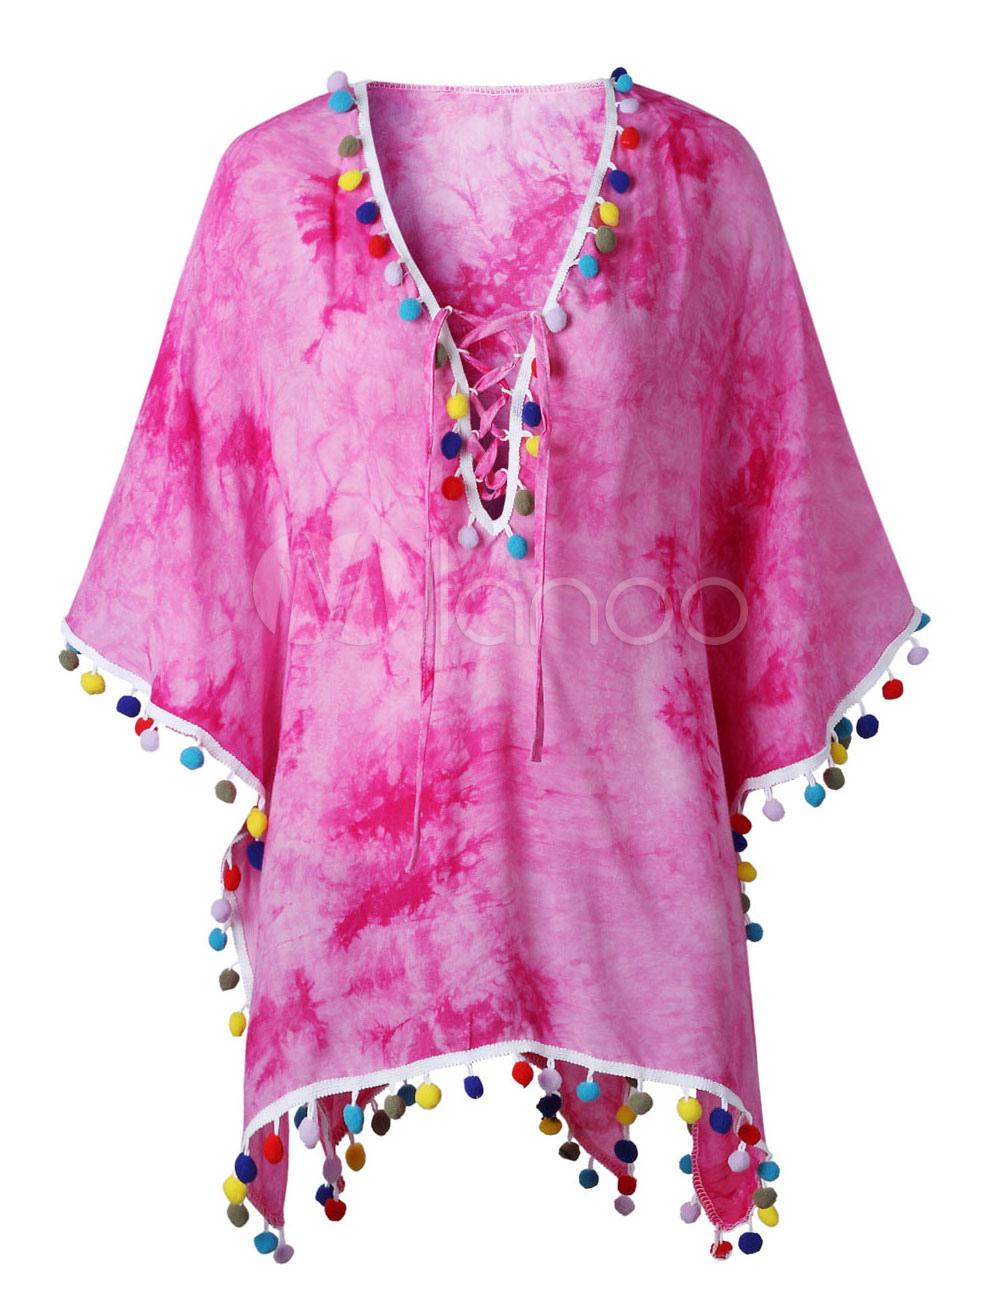 Buy Women Cover Up Oversized V Neck Pom Poms Tie Dye Pink Beachwear for $19.99 in Milanoo store